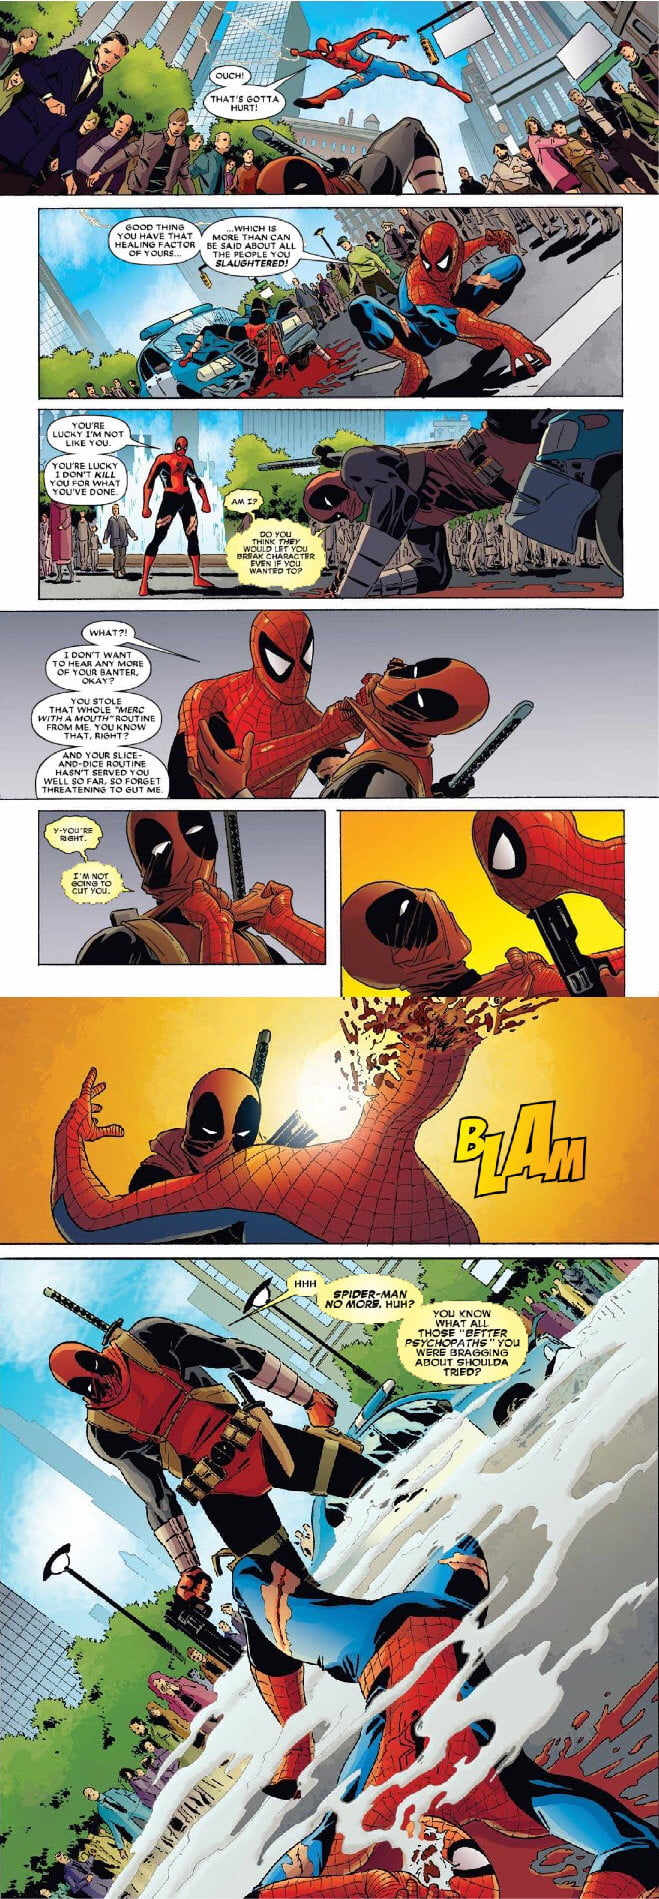 Love this Comic.(Deadpool kills the Marvel universe)